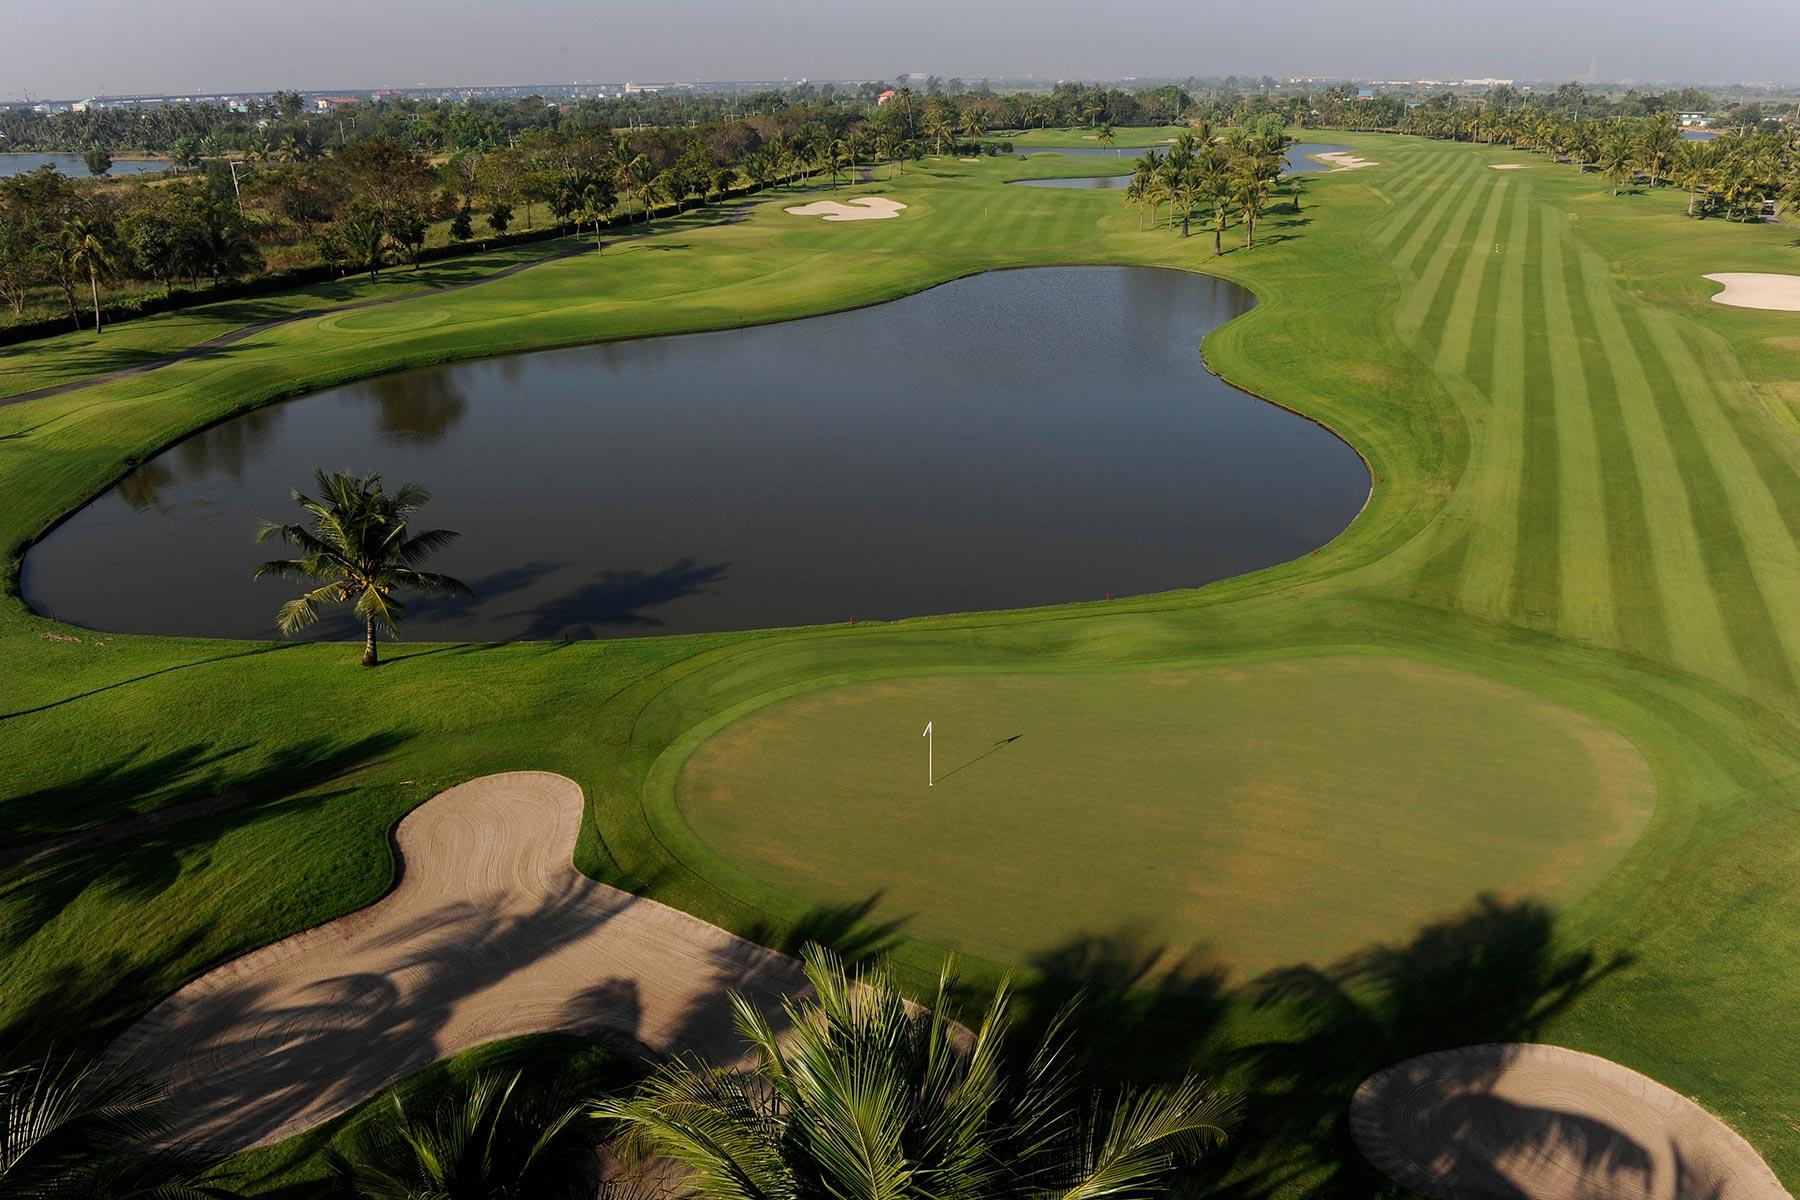 Course Review: Burapha Golf Club West Course, Chonchuri